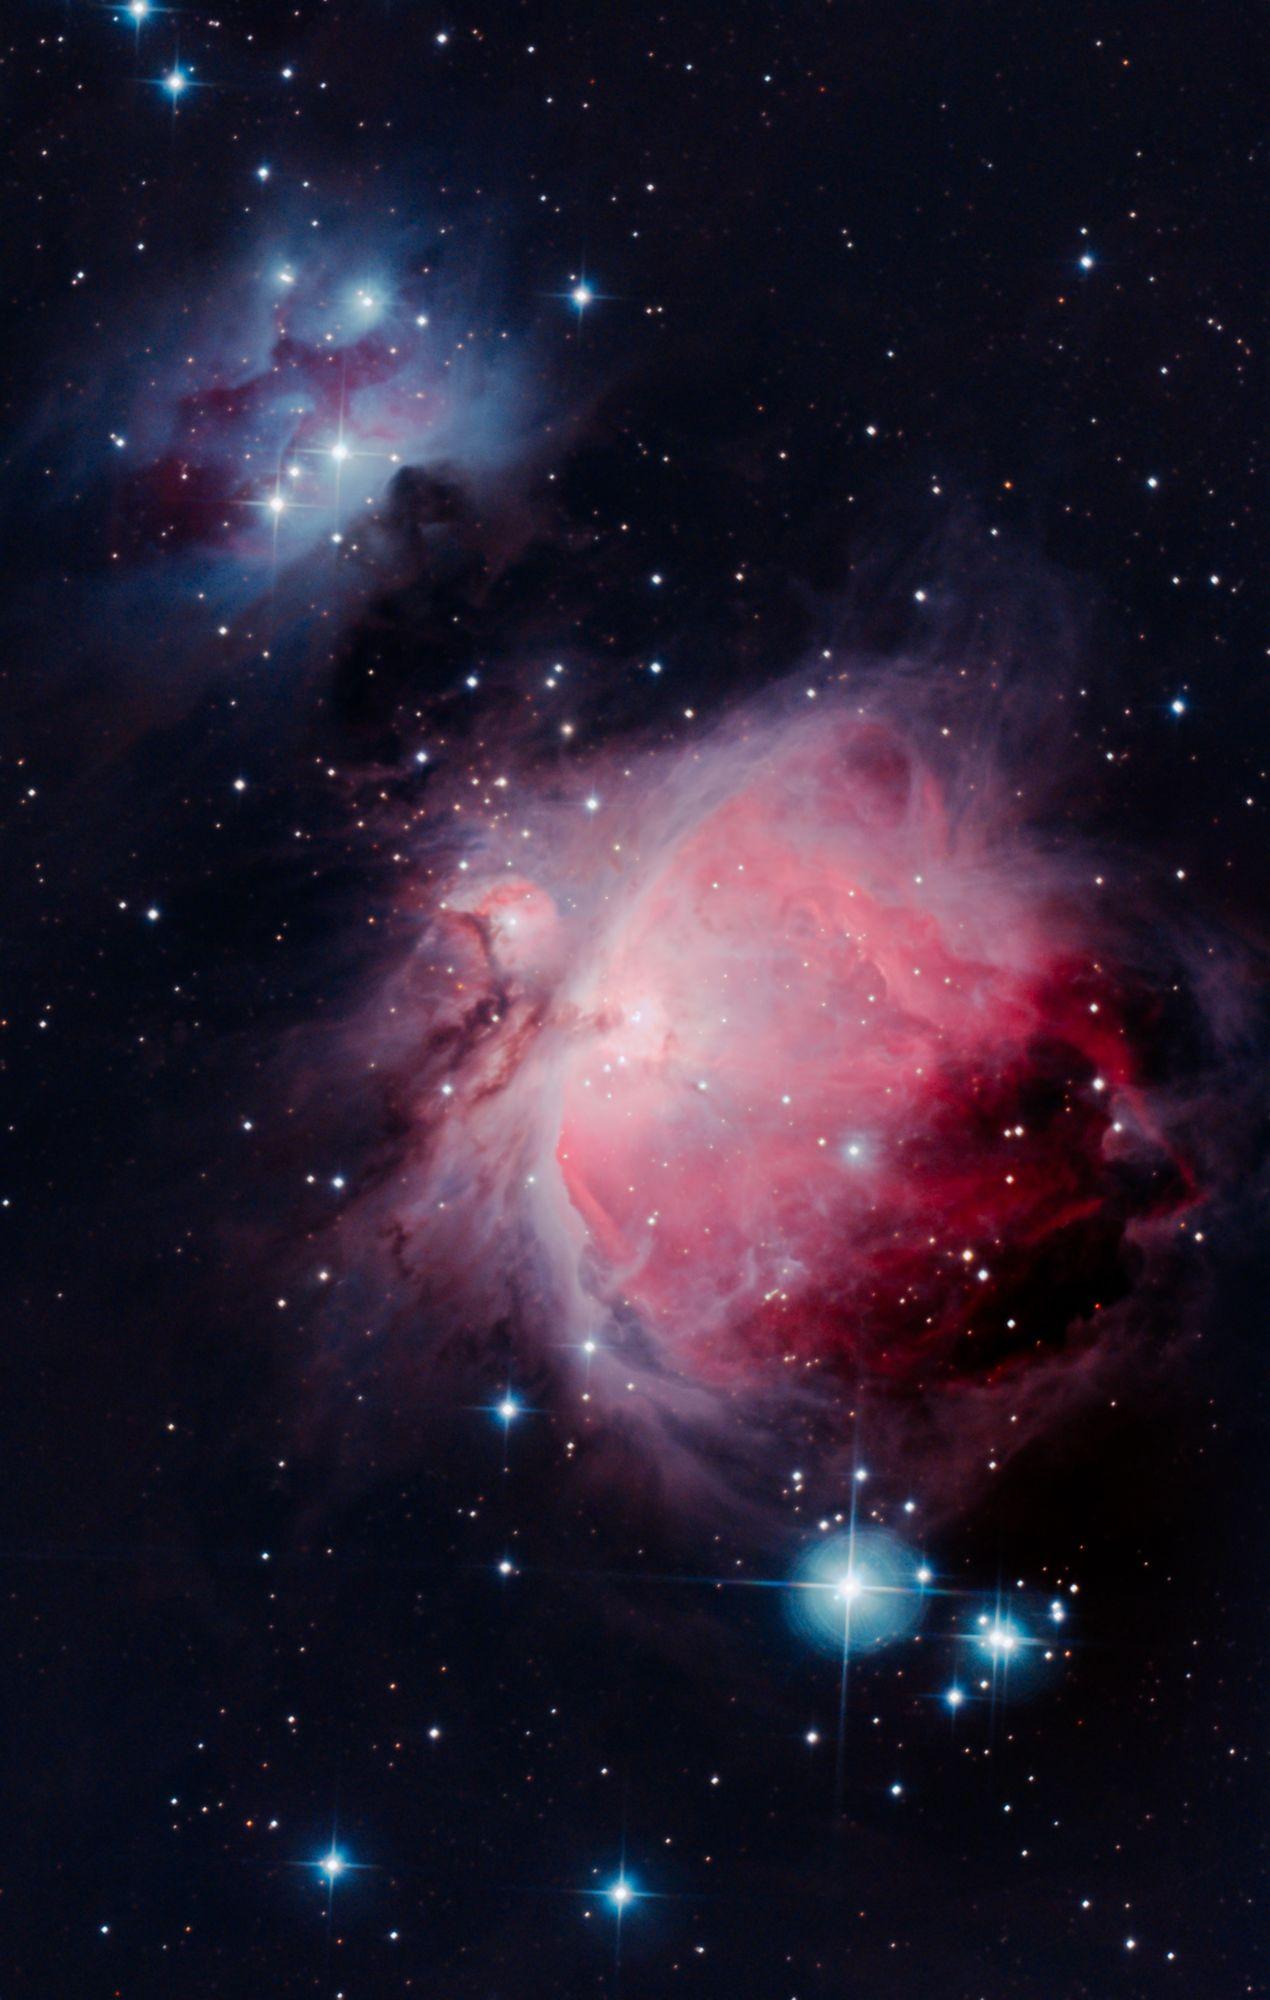 M42 & NGC 1977 - Orion and Running Man Nebulas